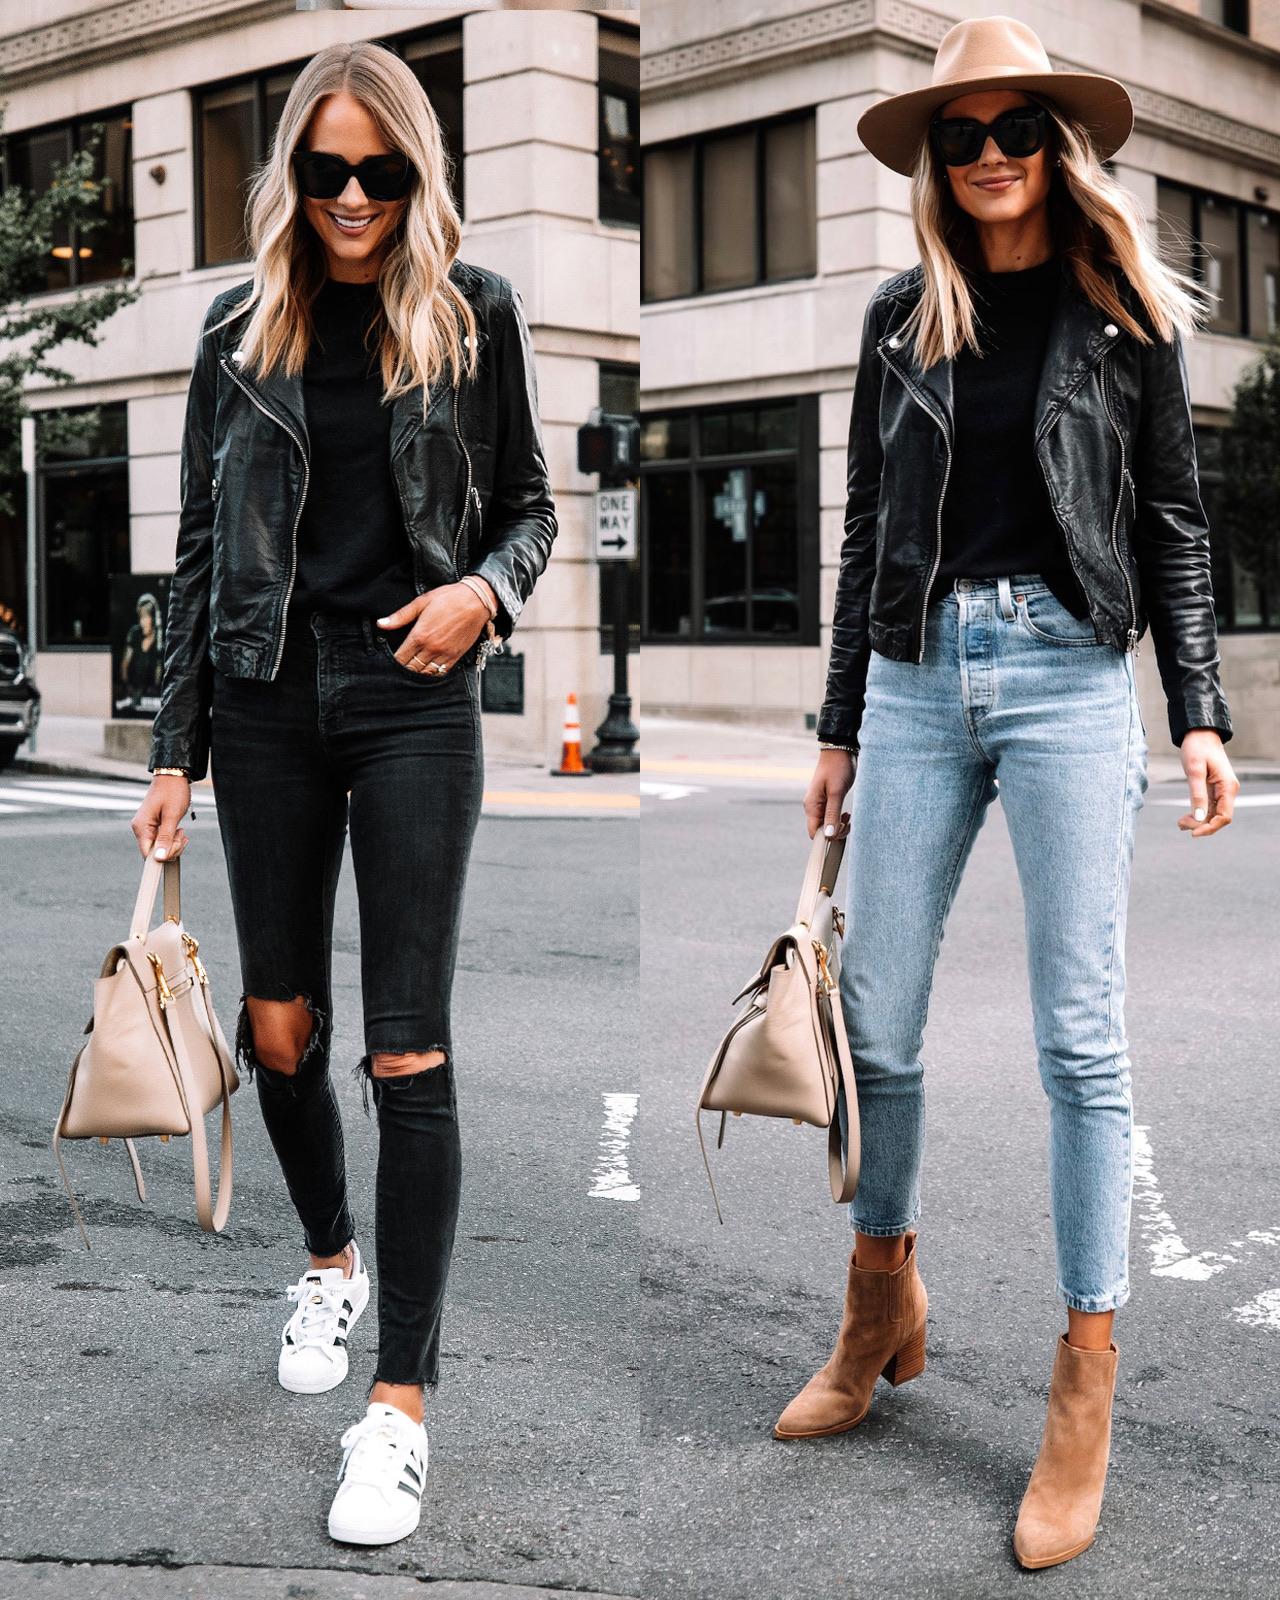 Fashion Jackson Wearing Black Leather Jacket Fall Outfits